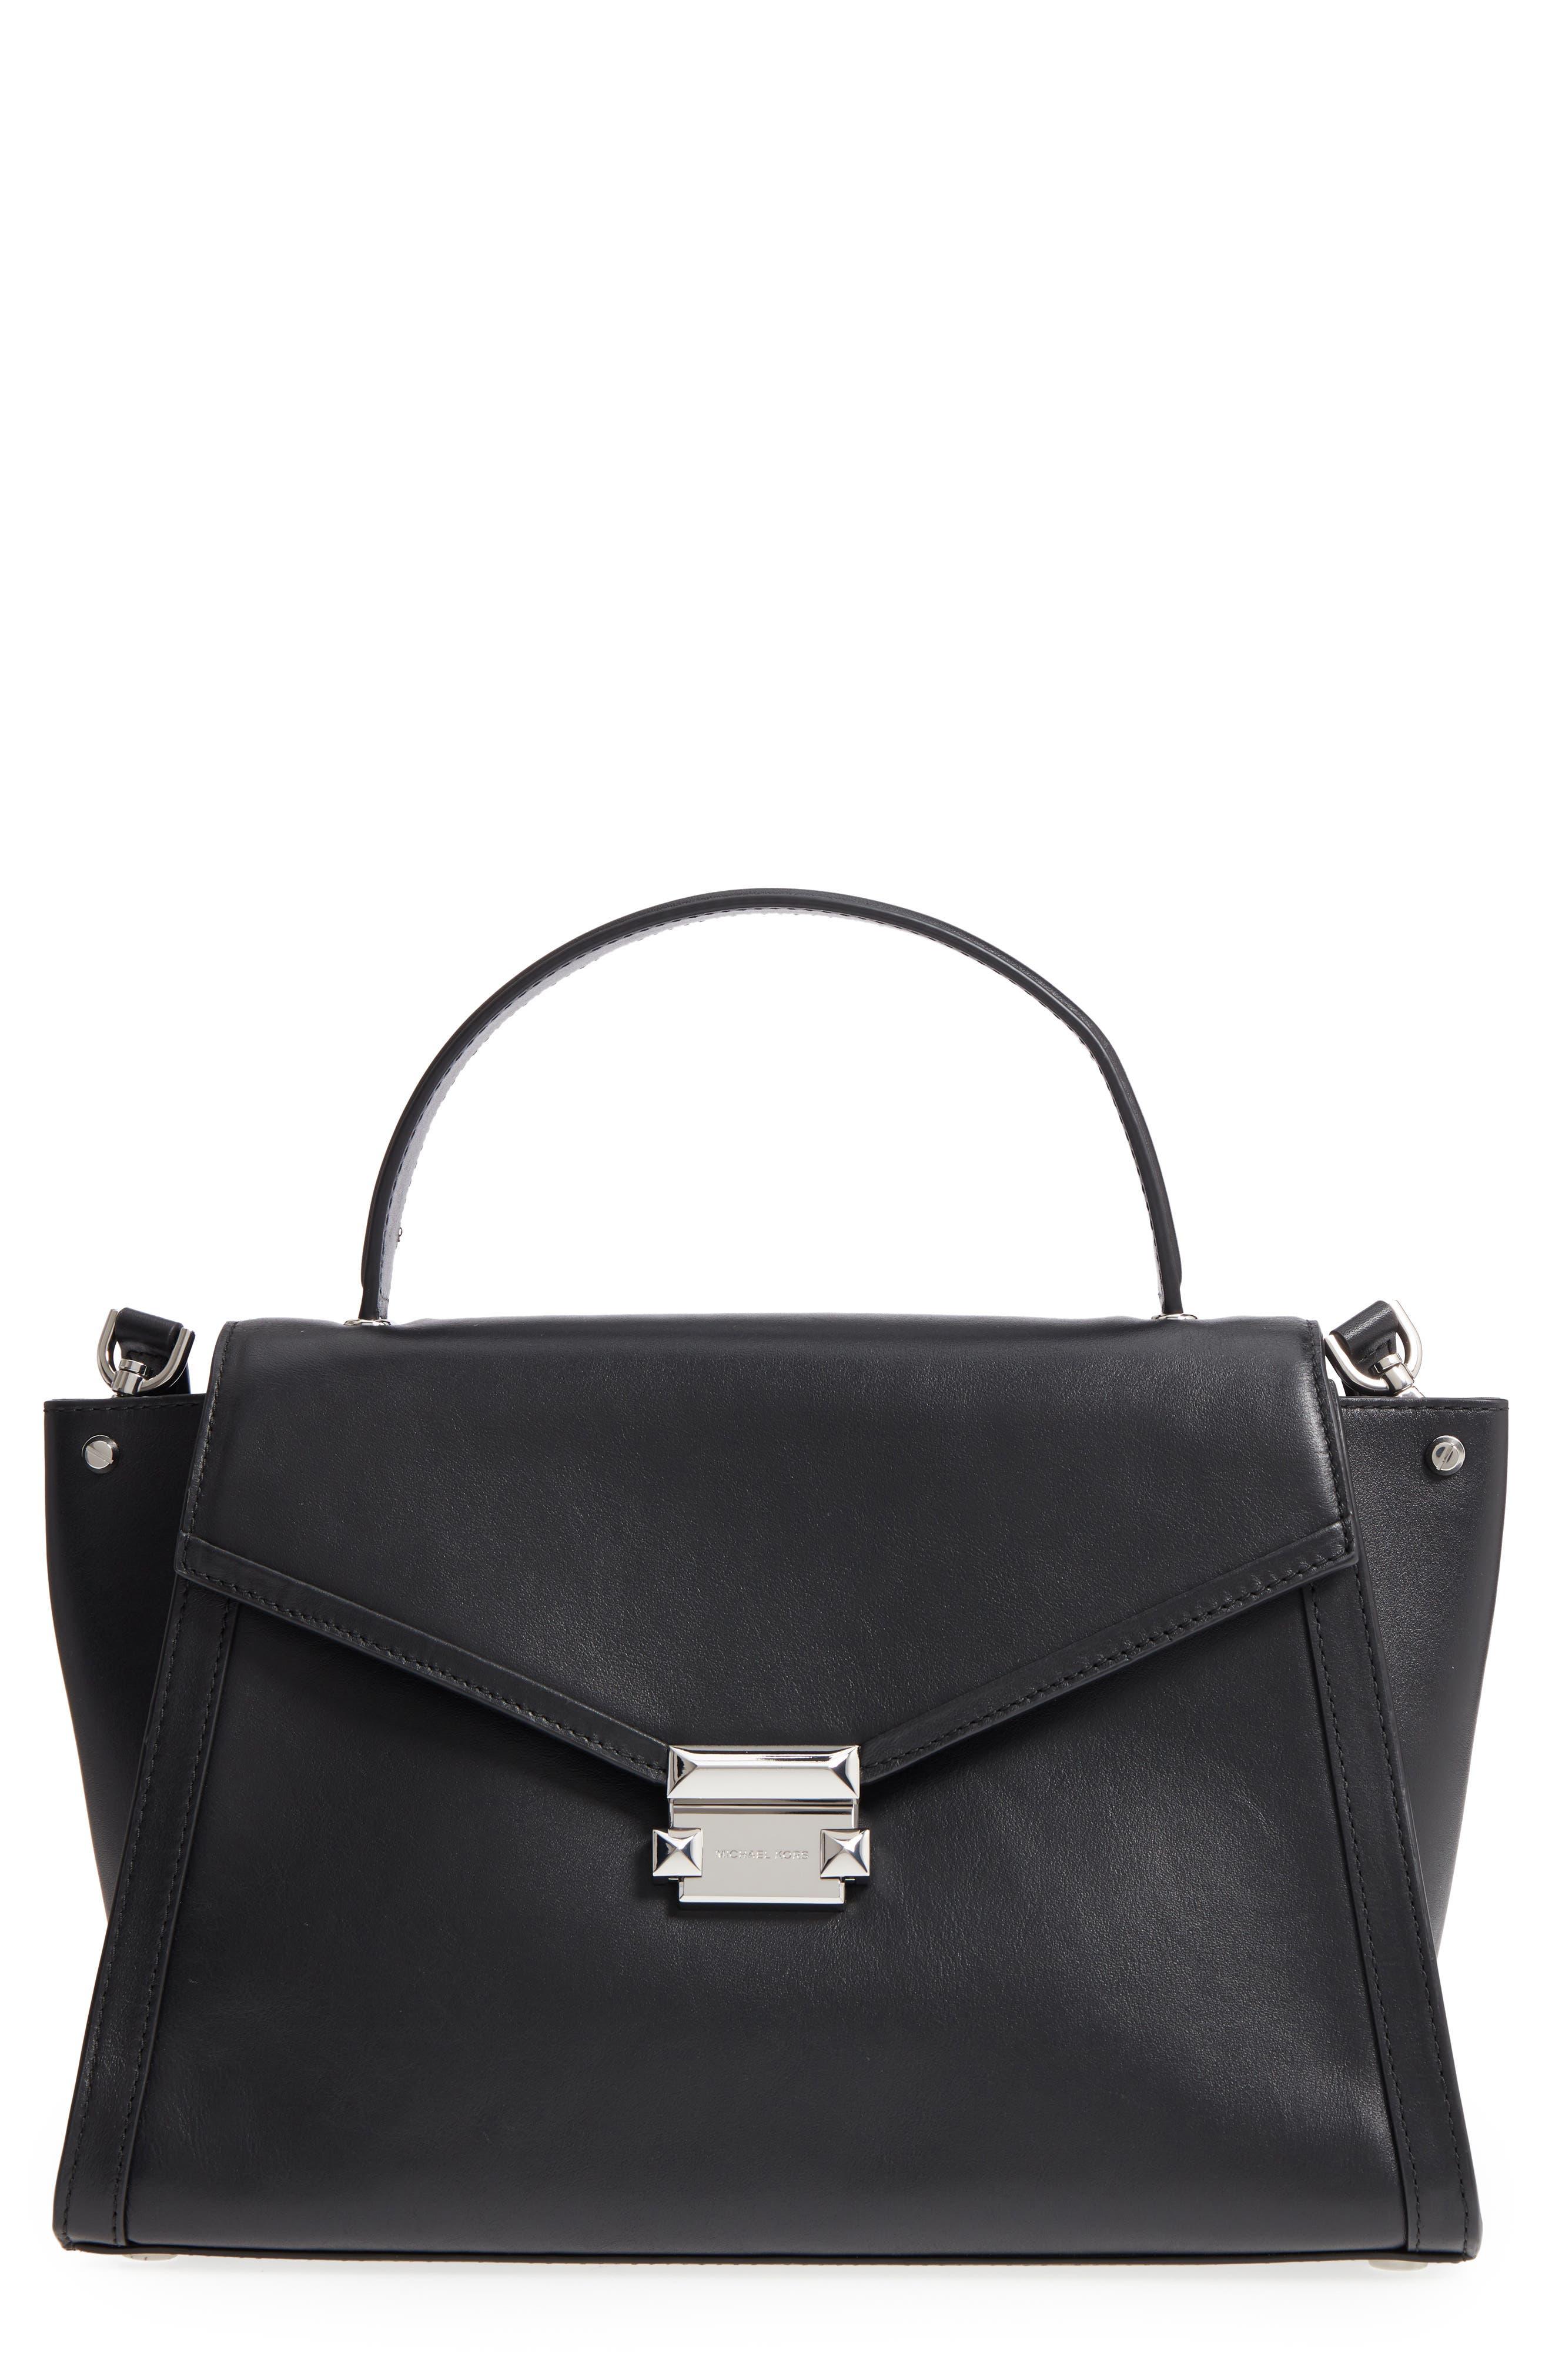 Mercer Large Leather Top-Handle Satchel Bag in Black